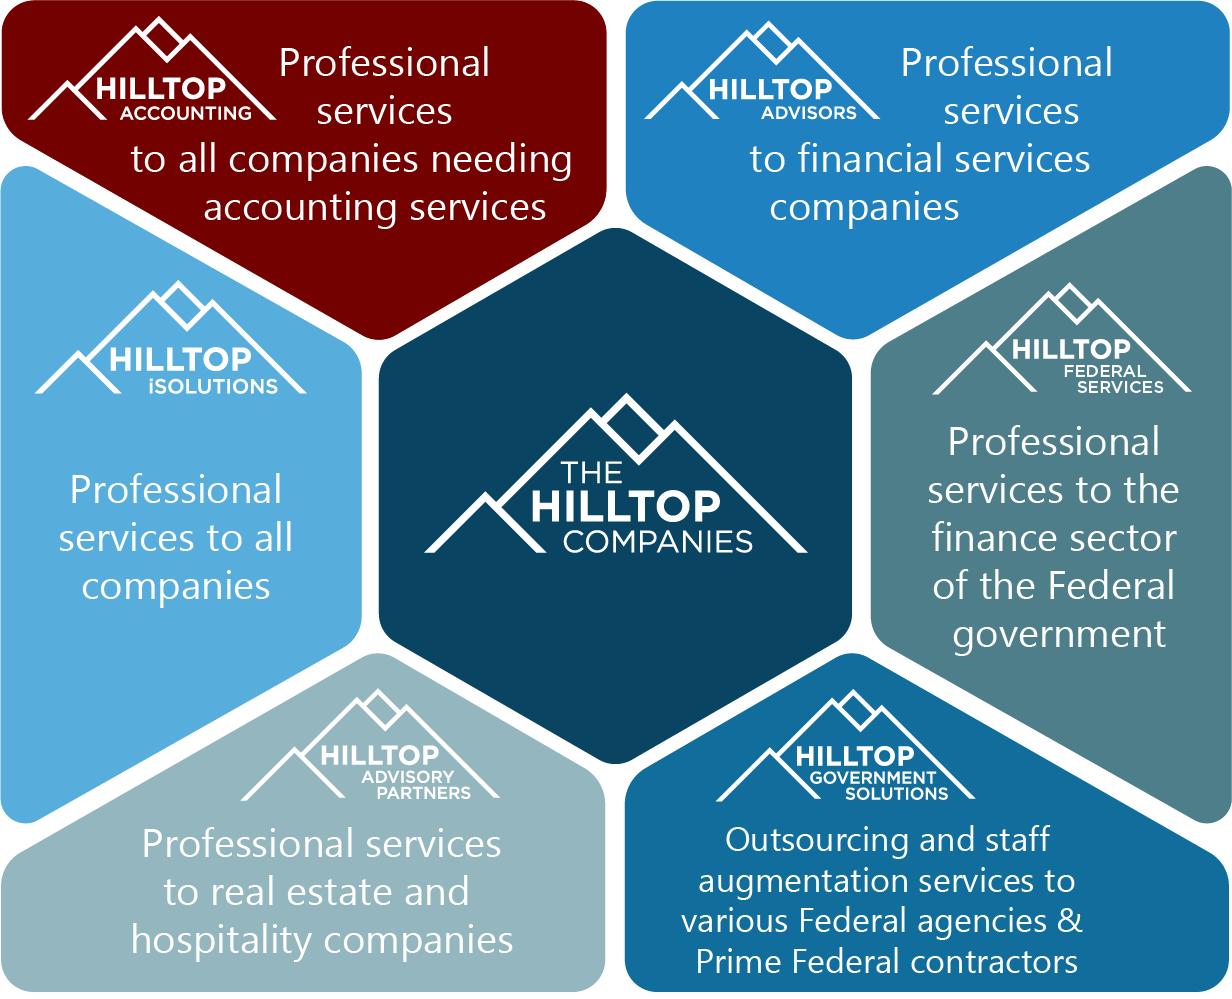 The Six Hilltop Companies